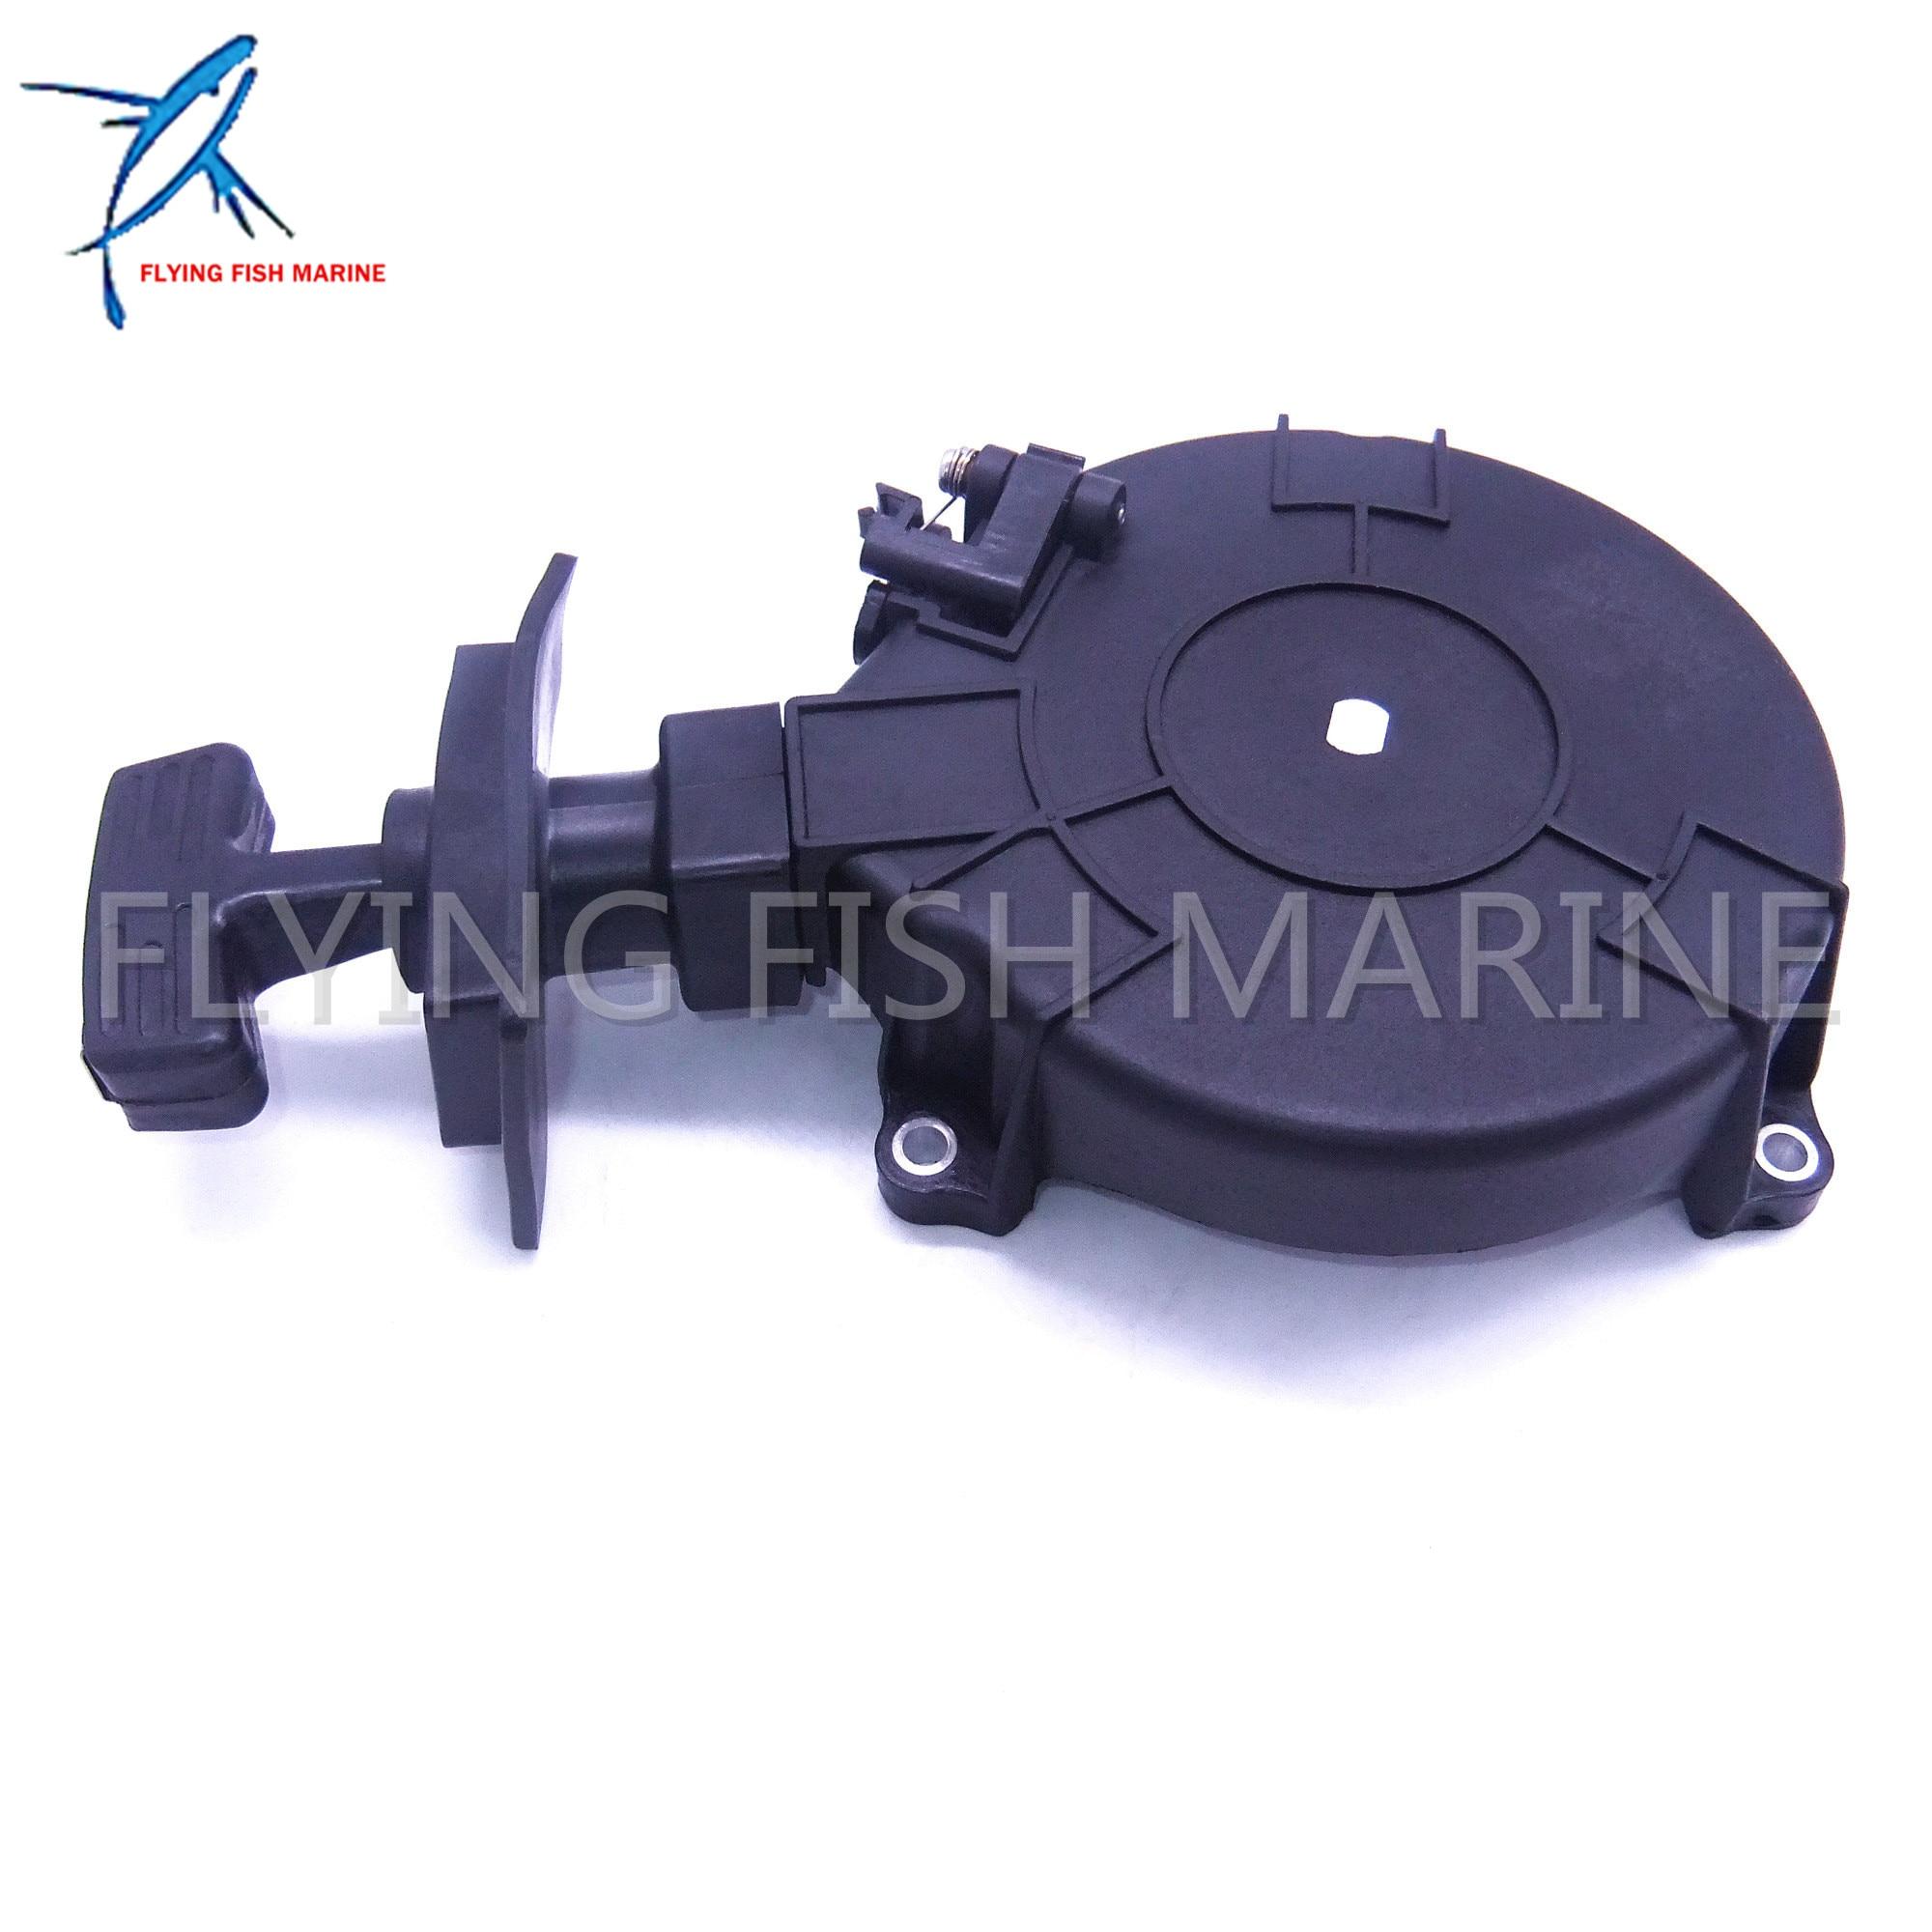 2-stroke 5hp 6hp Boat Outboard Motor Pull Starter Assy For Hangkai 2-stroke 5hp 6hp Boat